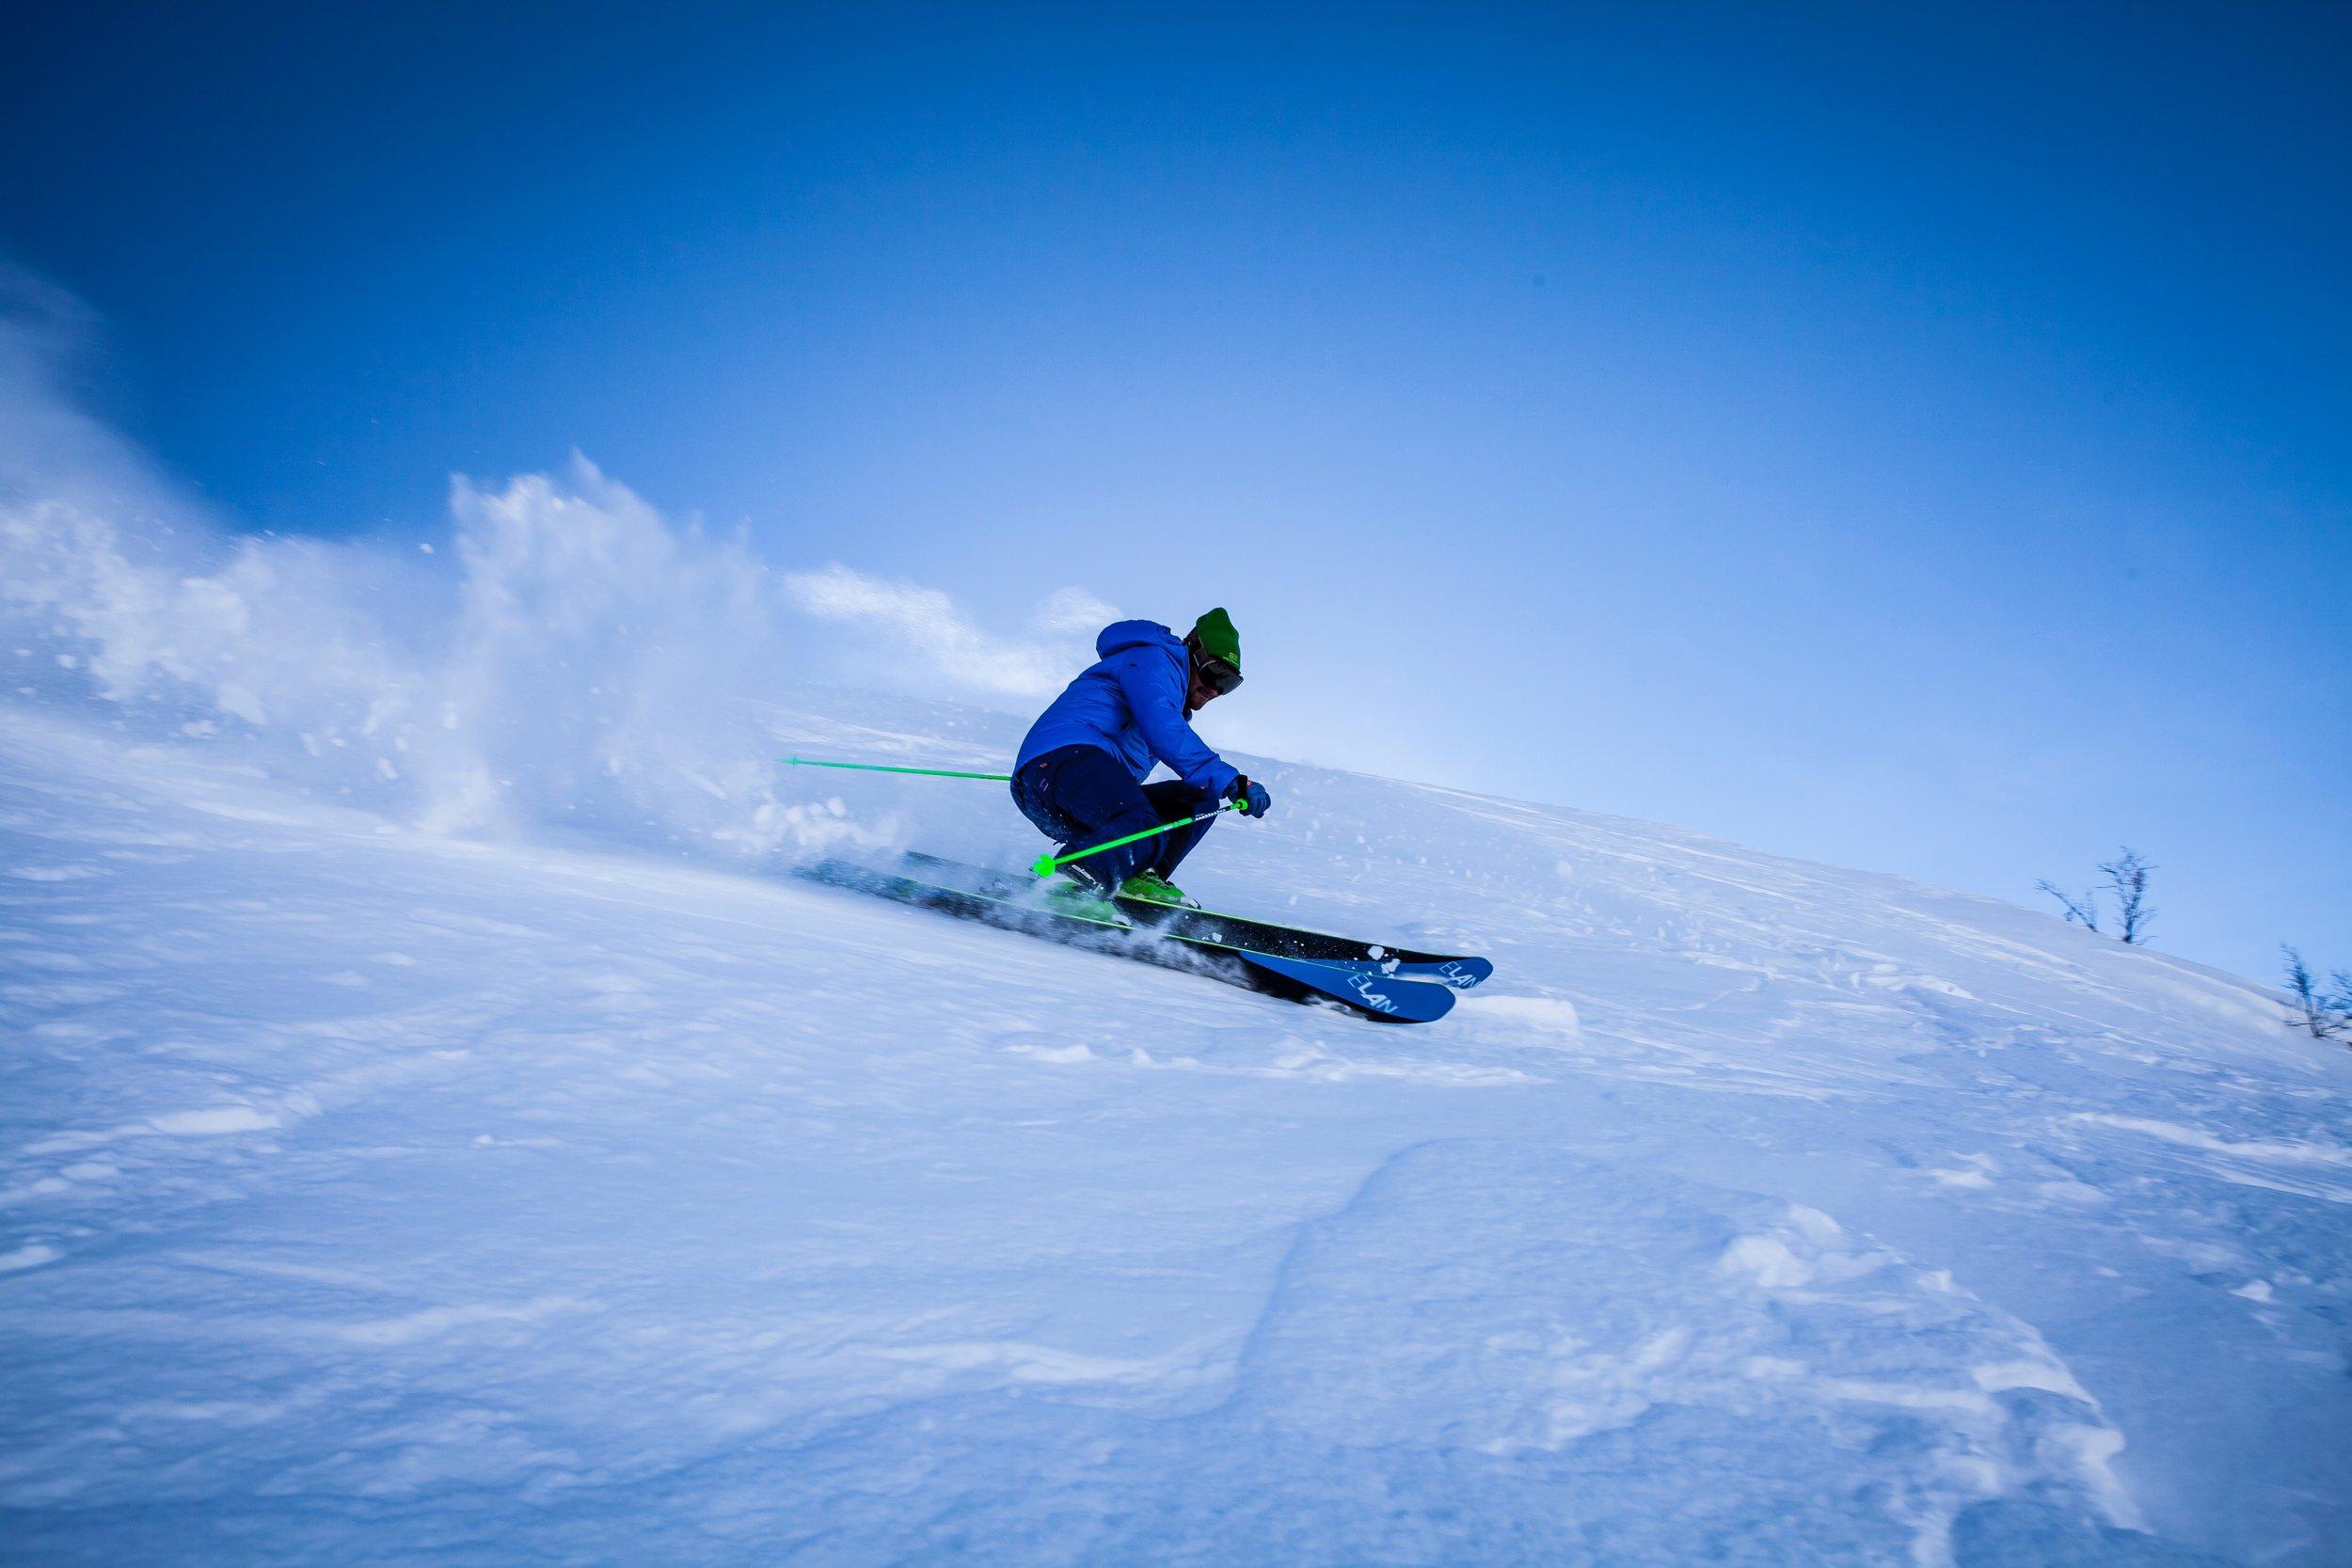 "<img src=""action-adventure-alpine-298005.jpg"" alt=""man skiing snow alpine piste"">"